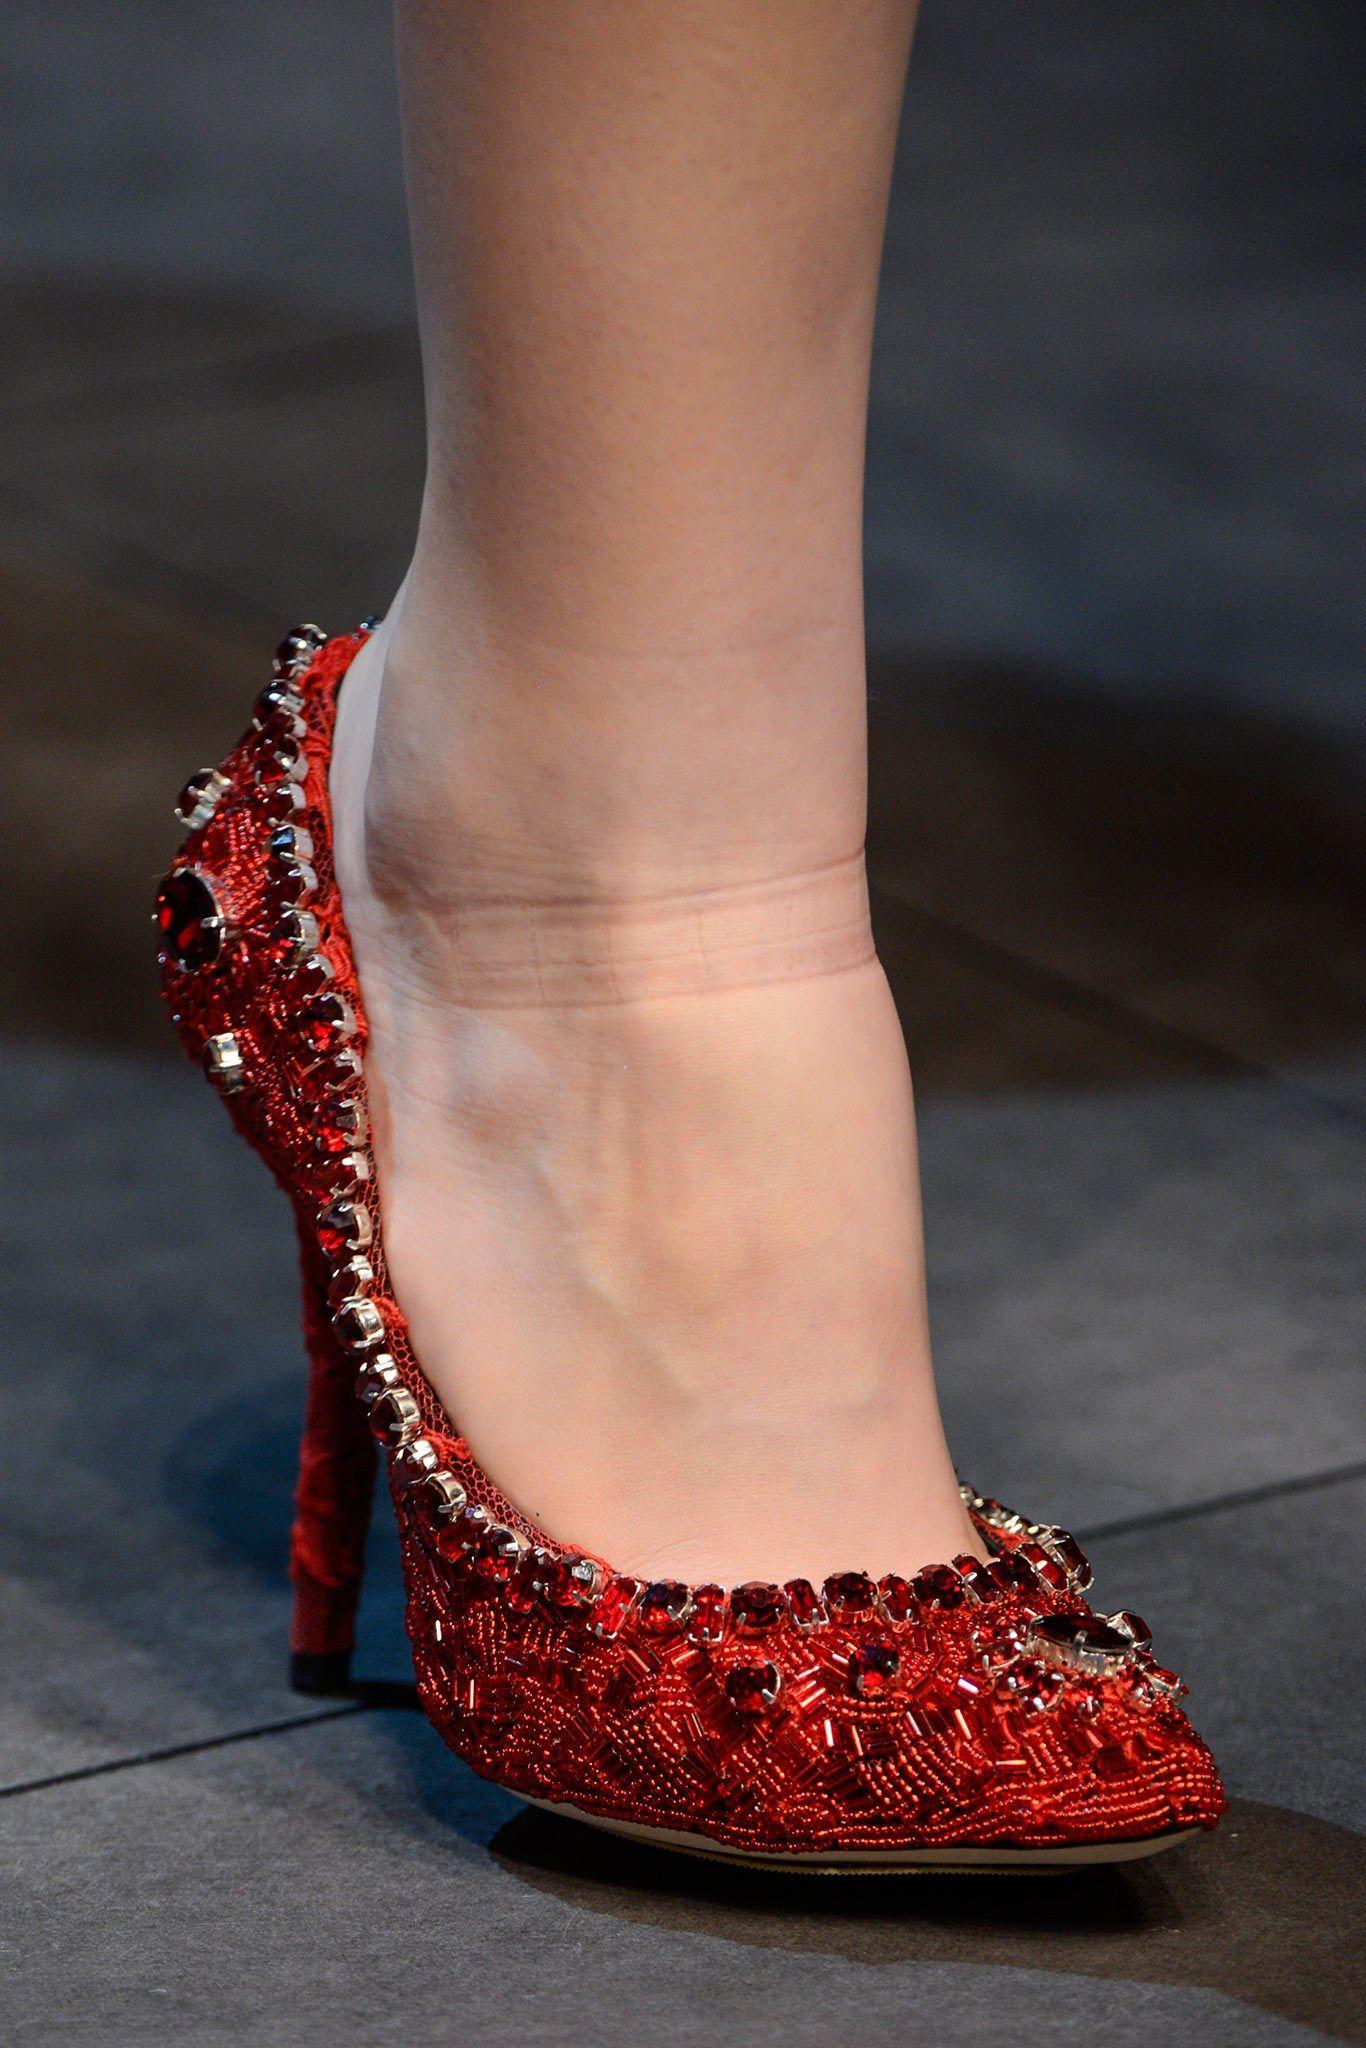 Dolce&Gabbana秋季2013成衣配饰照片 - 时尚